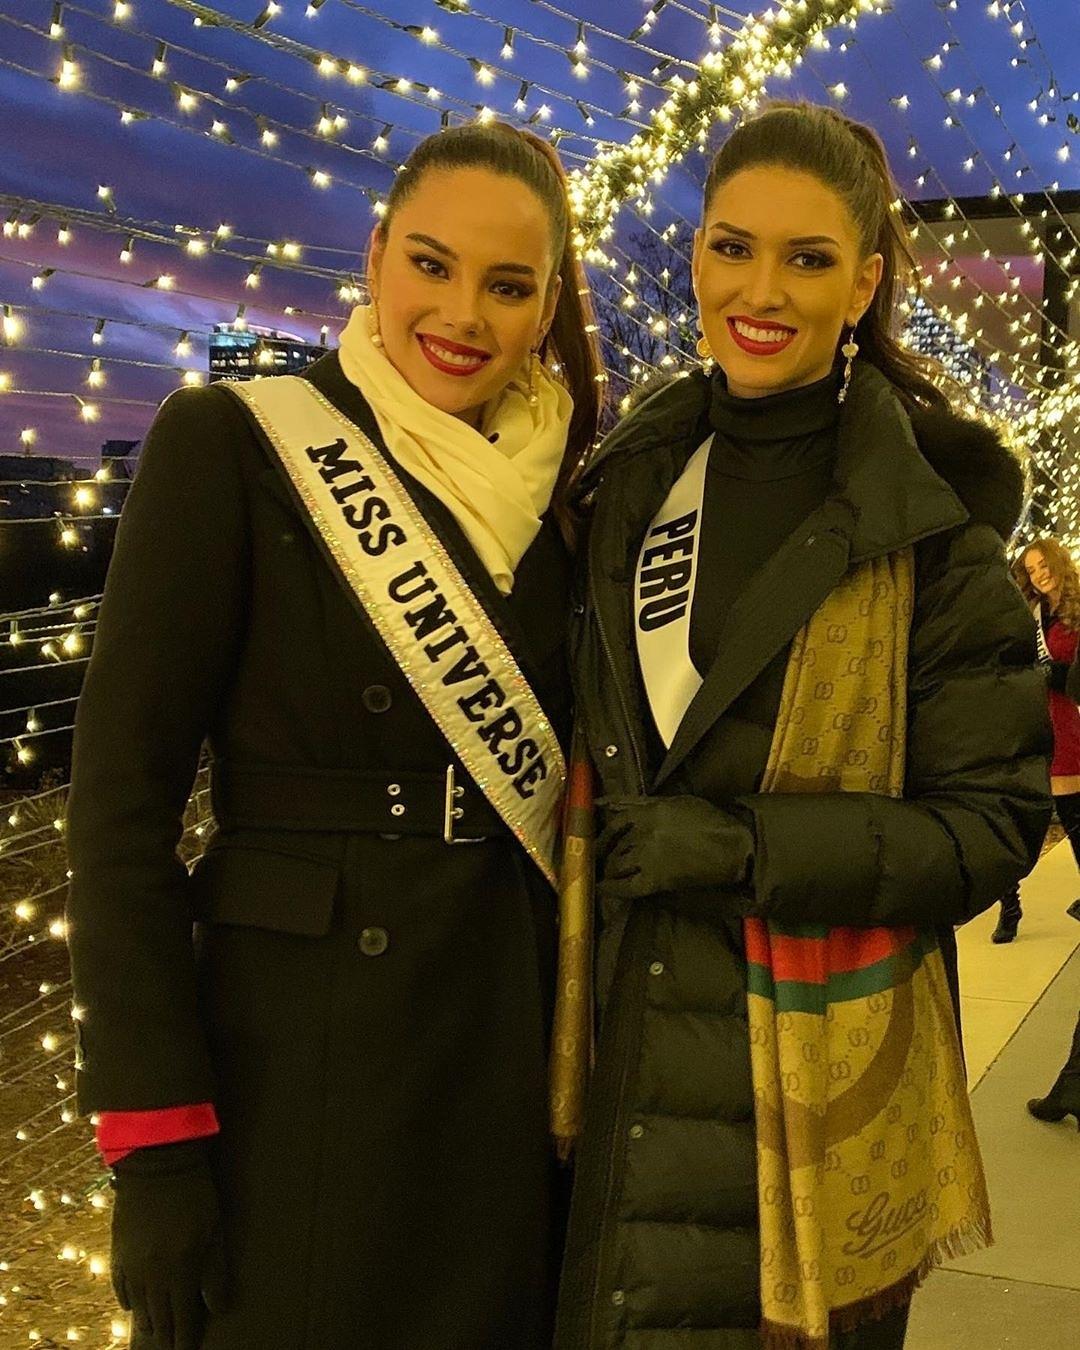 kelin rivera kroll, top 10 de miss universe 2019/2nd runner-up de miss eco international 2018/world miss university 2016. - Página 16 73712512